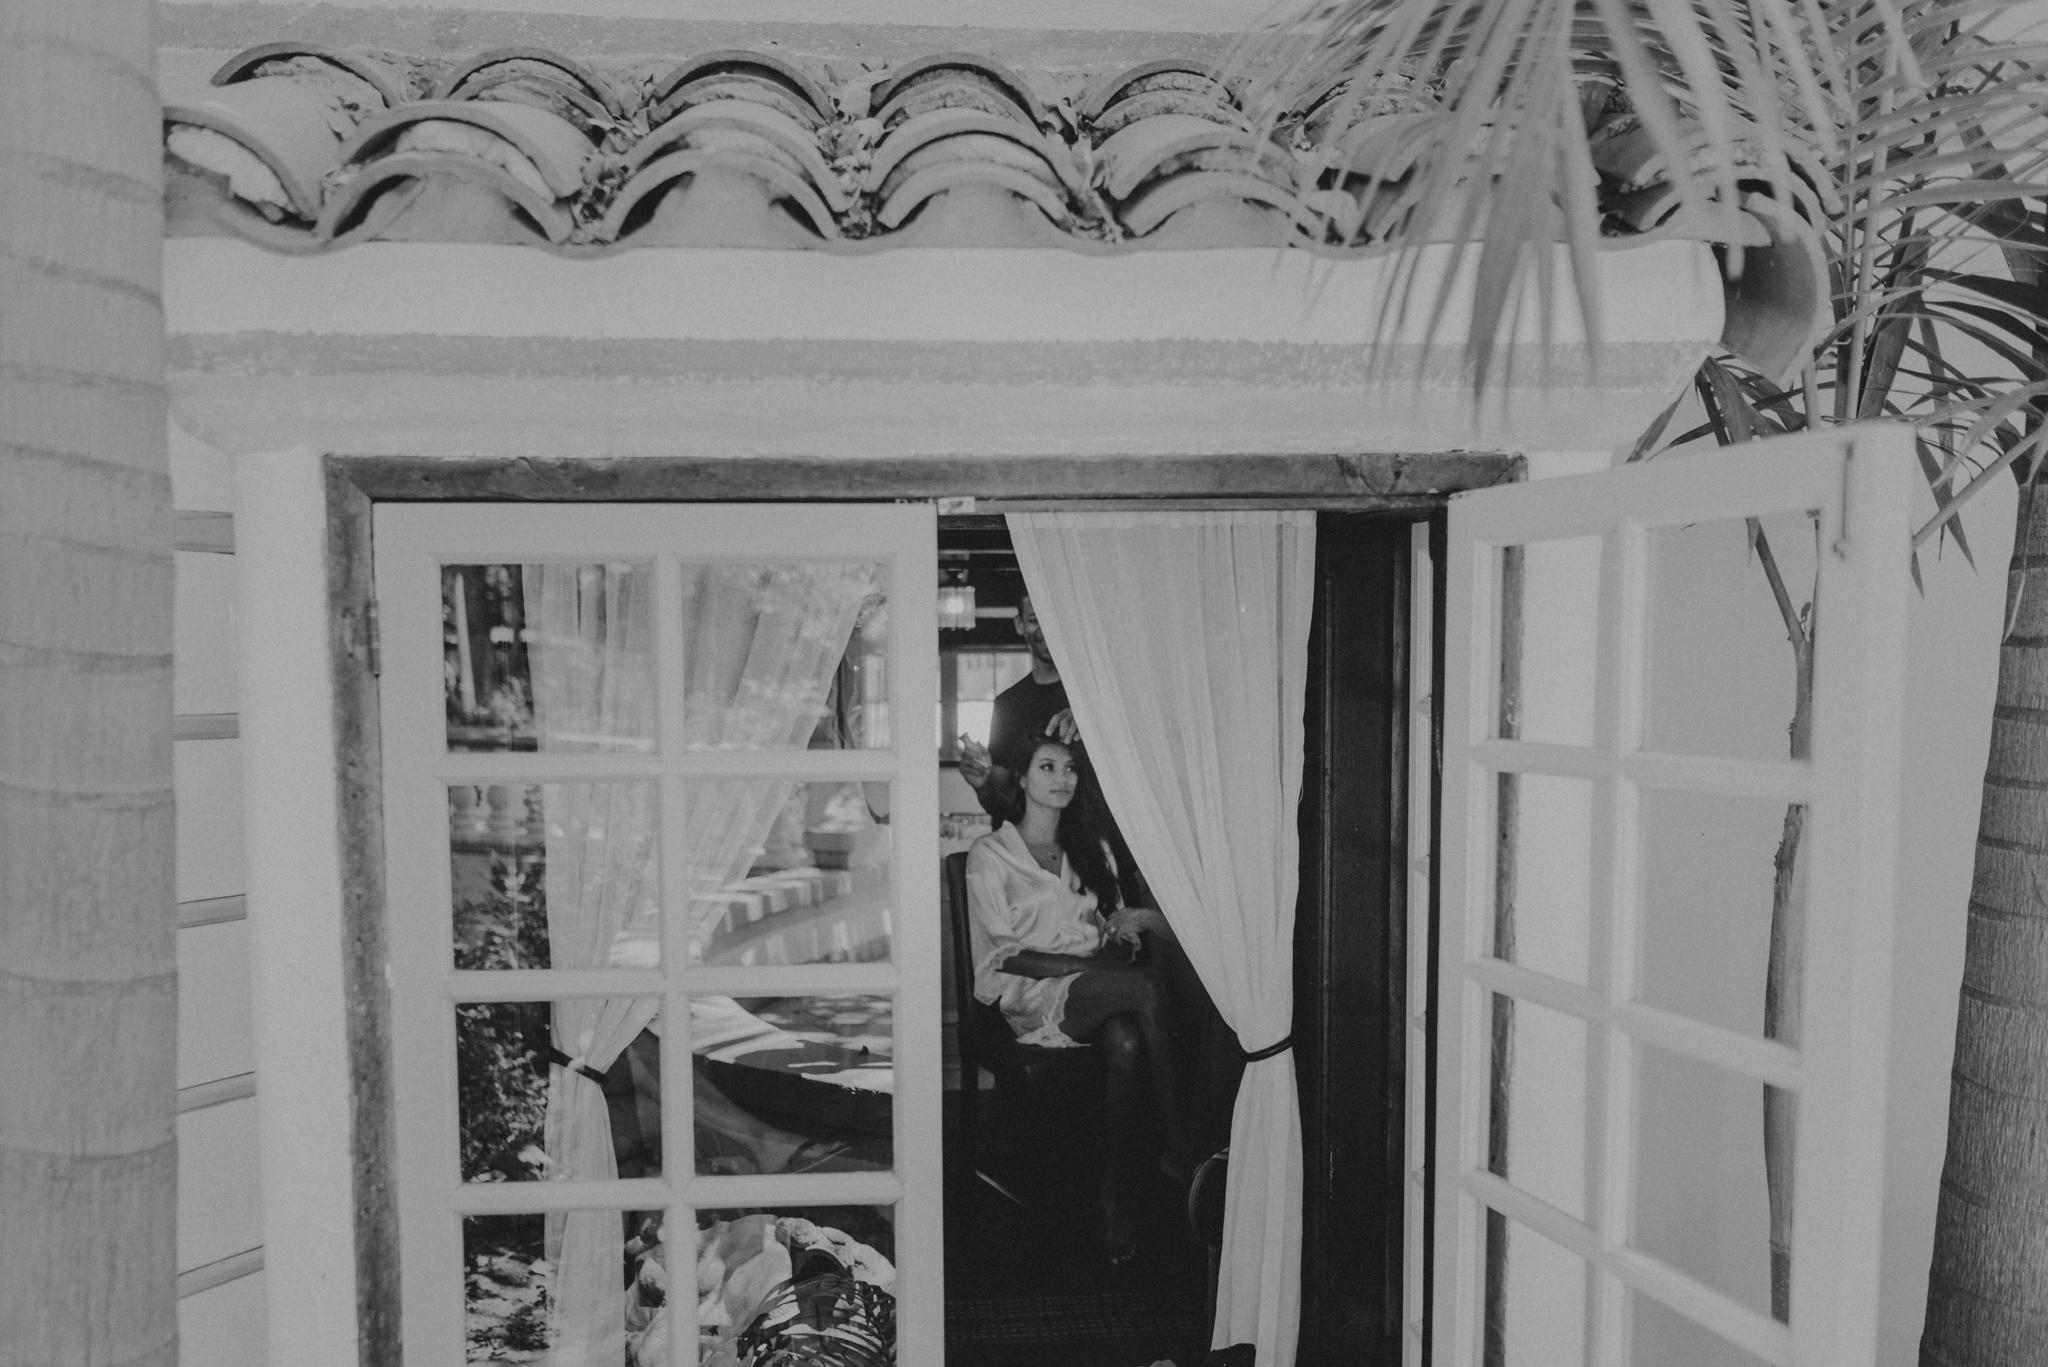 Isaiah + Taylor Photography - Rancho Las Lomas Wedding, Los Angeles Wedding Photographer-004.jpg